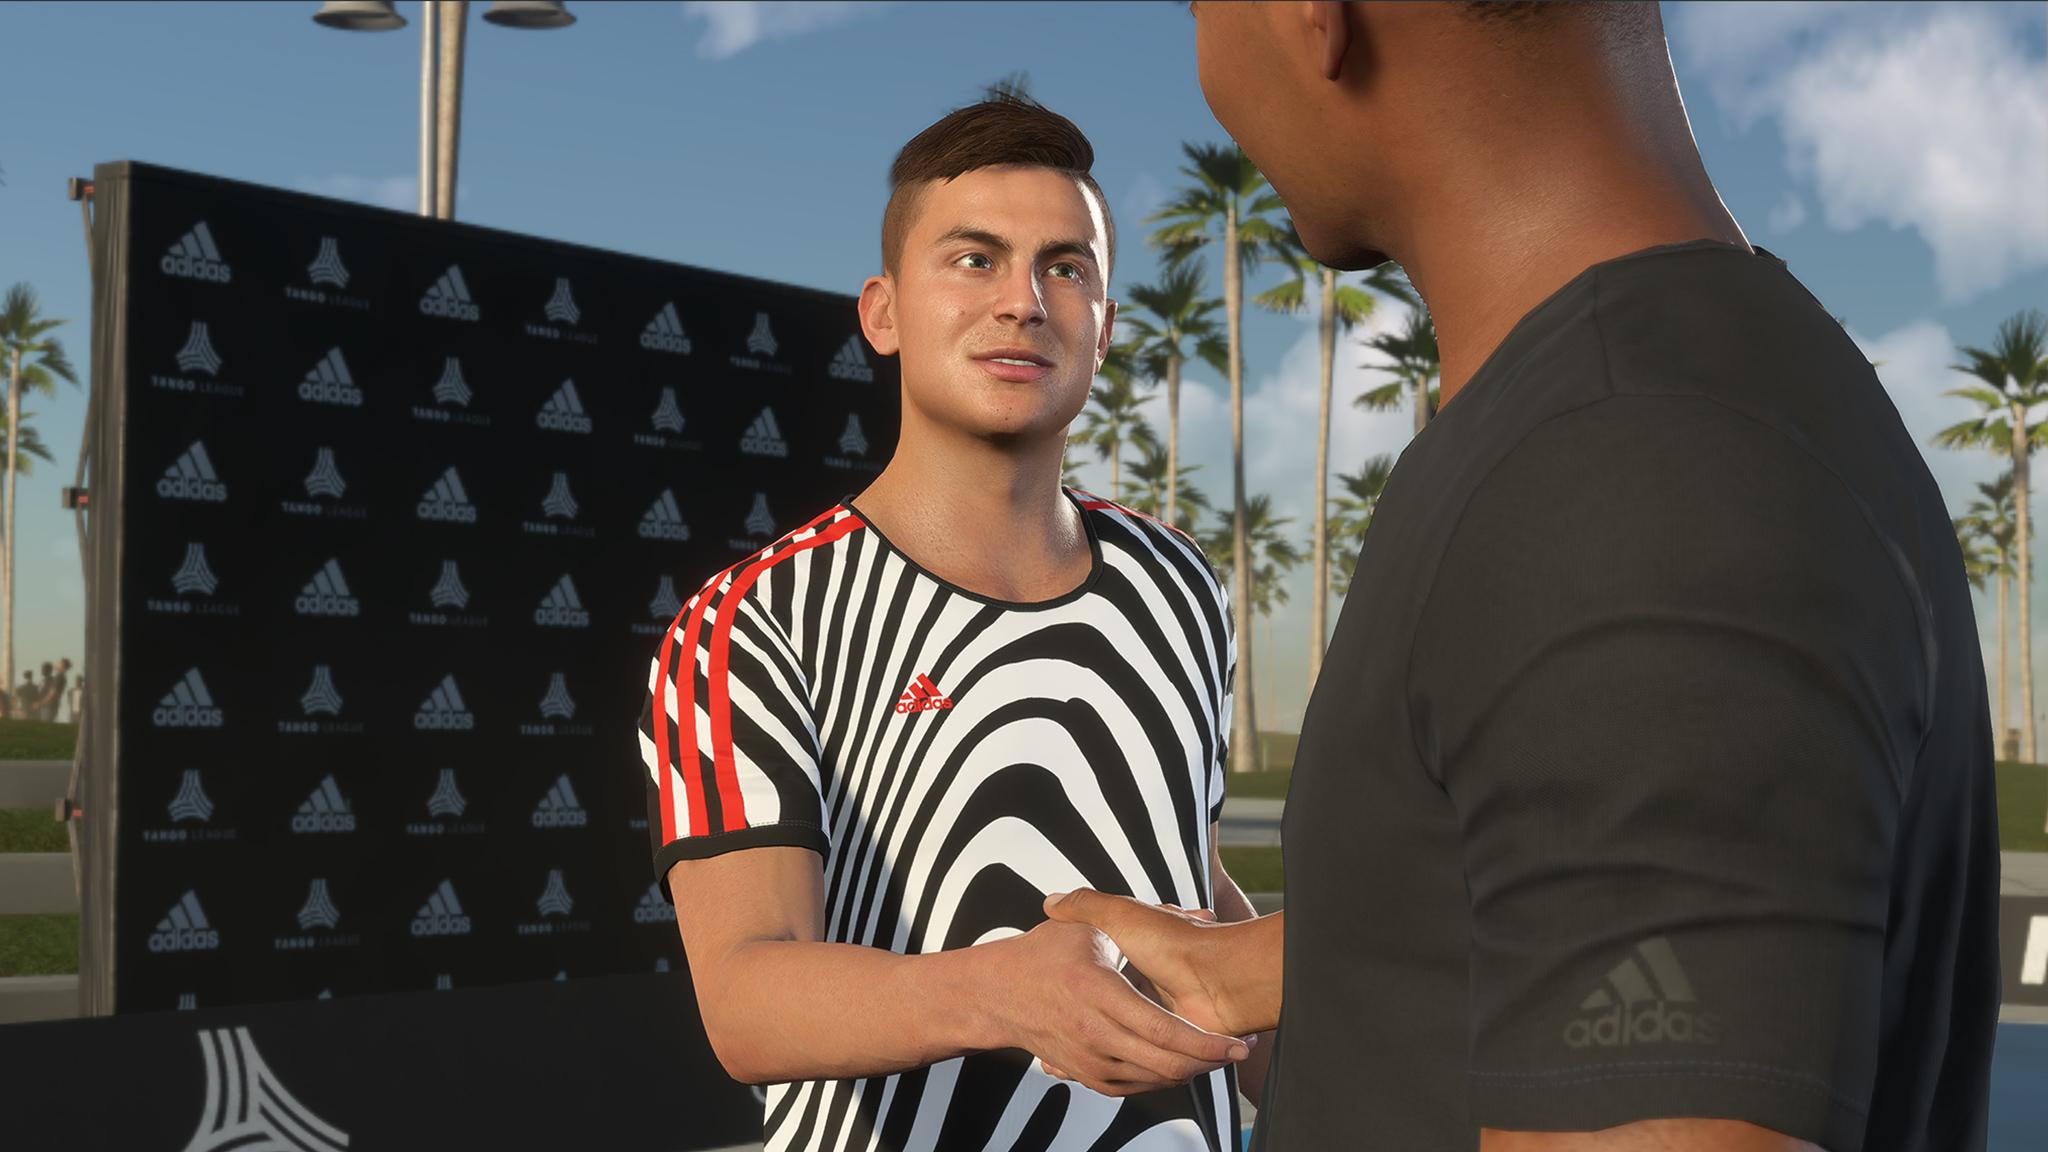 FIFA19-Tile-Large-Meet-The-Worlds-Best-lg-2x.jpg